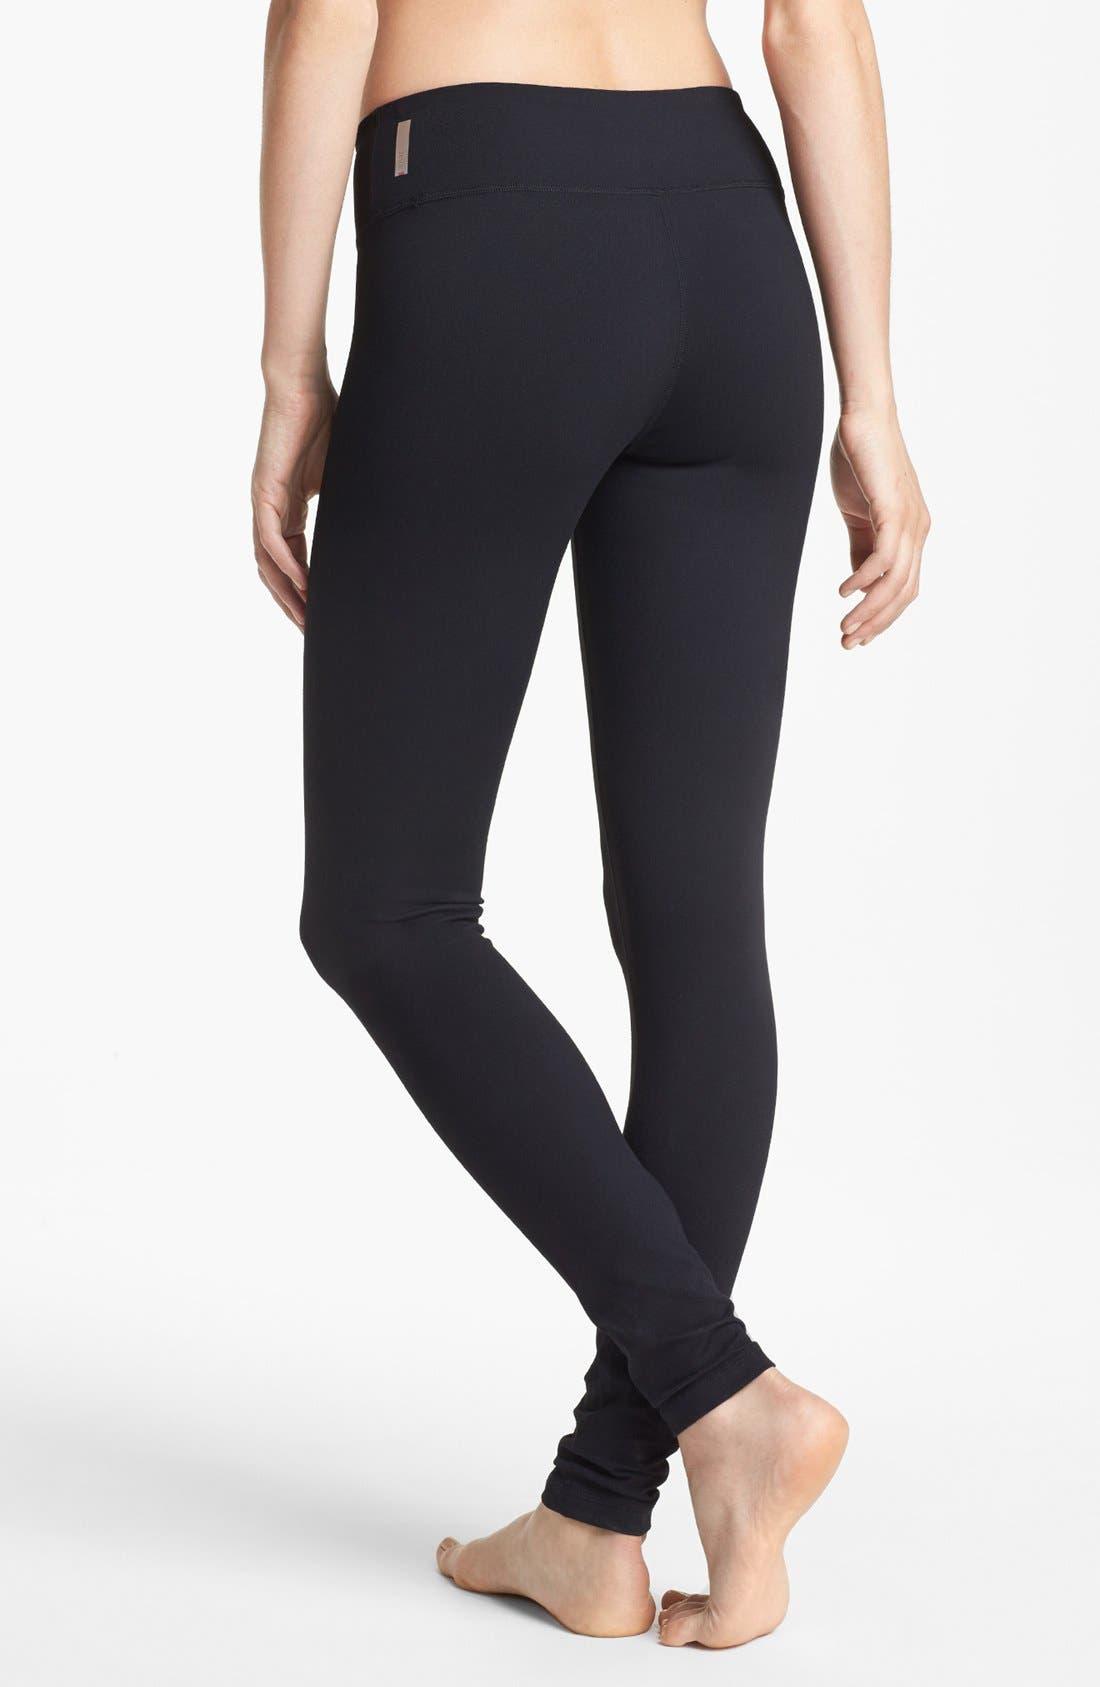 Black dress pants 00 zulu